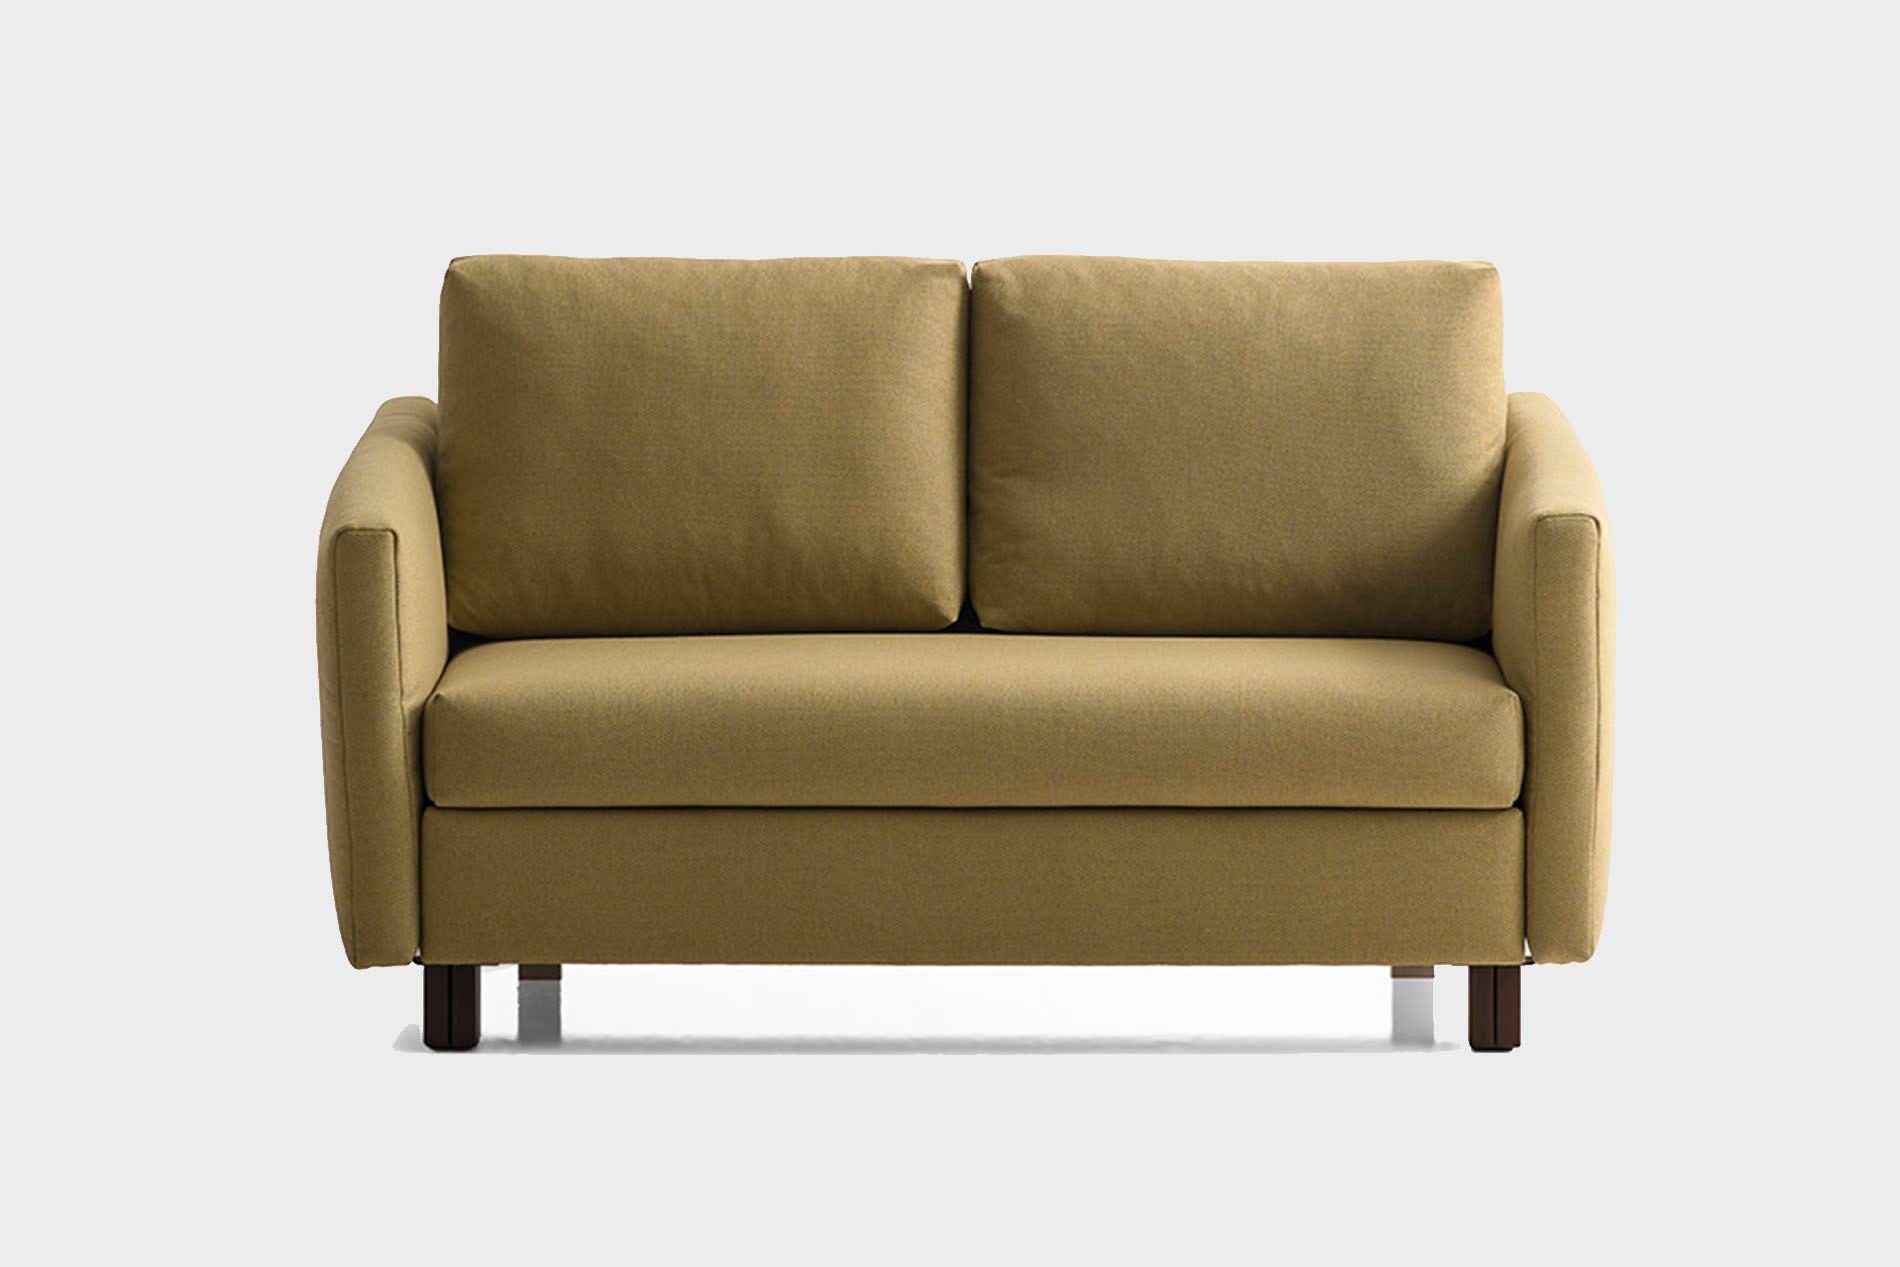 schlafsofa vela von franz fertig. Black Bedroom Furniture Sets. Home Design Ideas